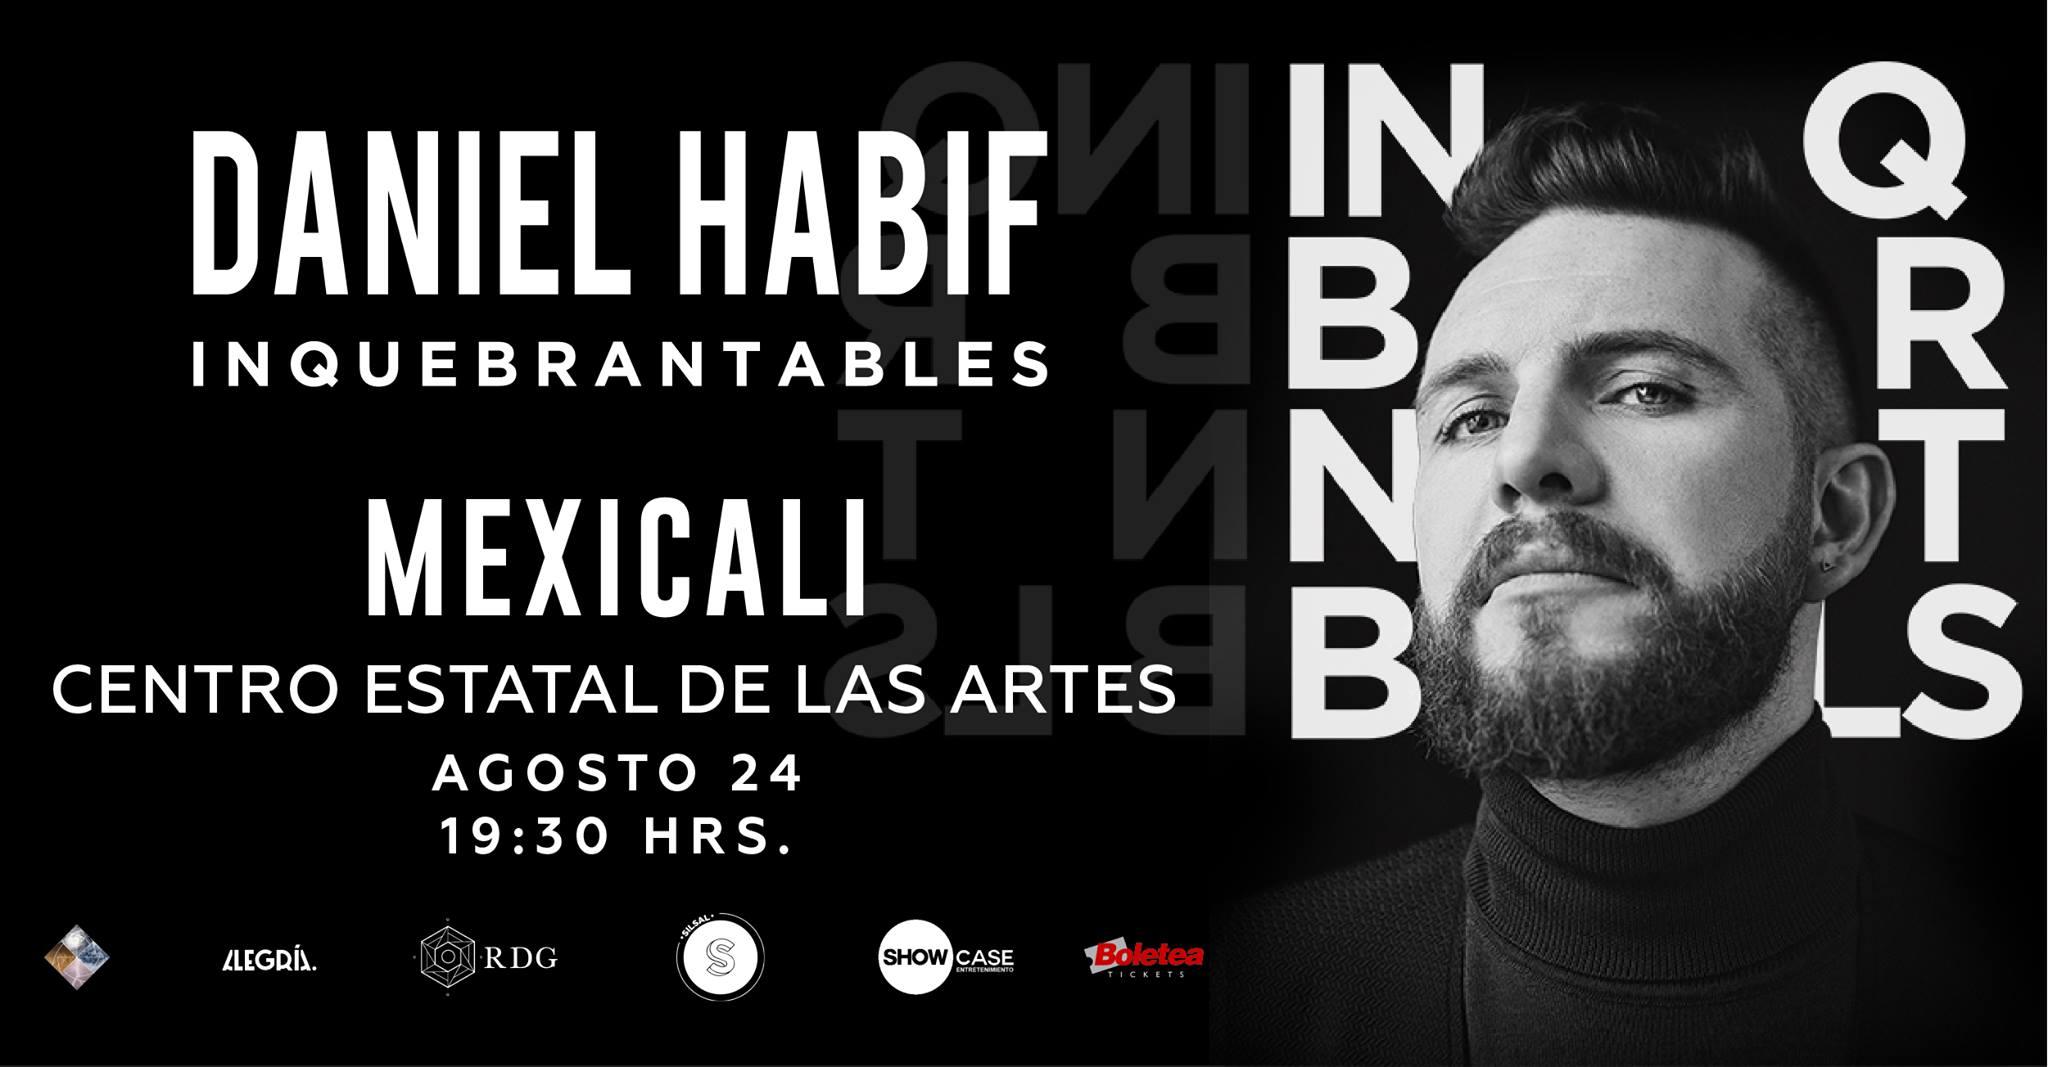 Inquebrantable Daniel Habif